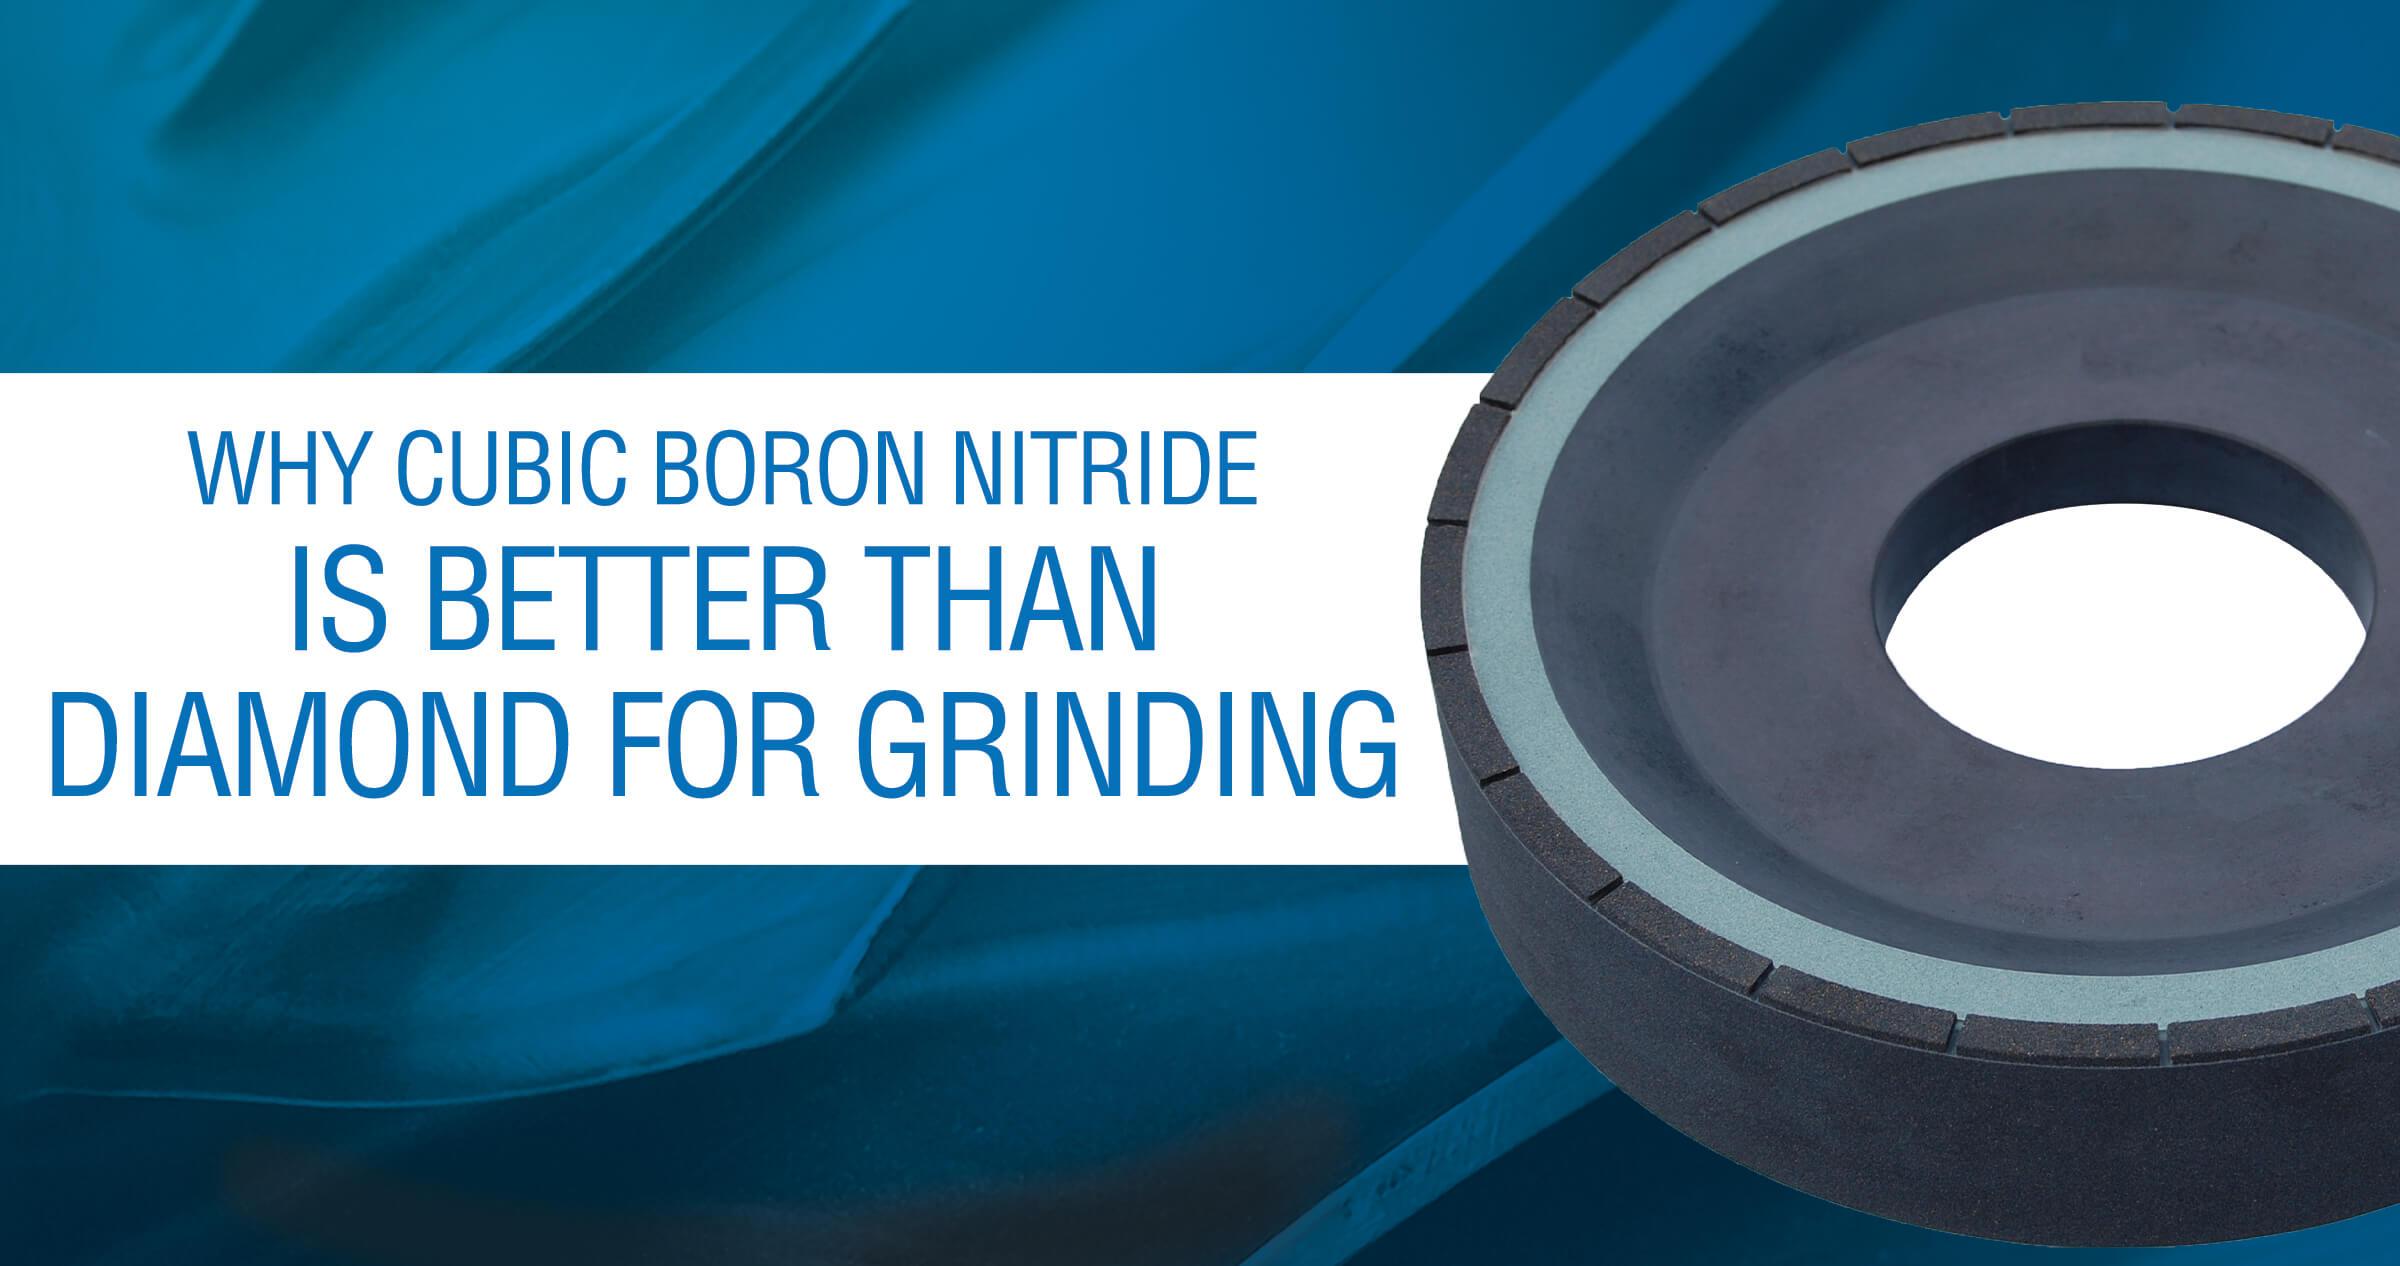 Cubic-Boron-Nitride-Blog.jpg